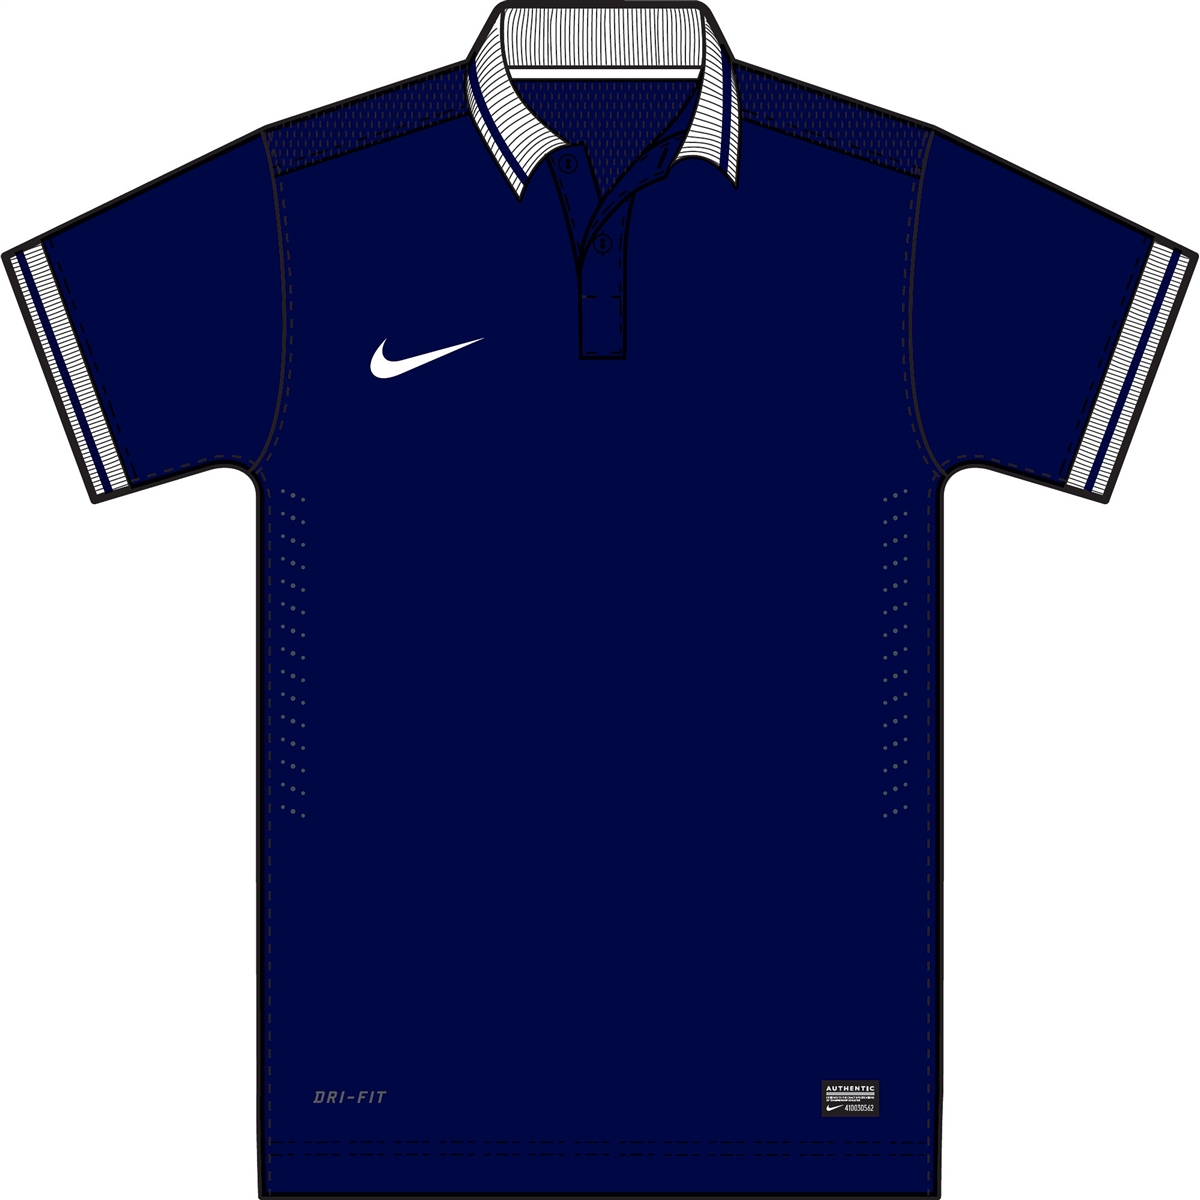 nike 1415 teamwear kits nike 20142015 templates